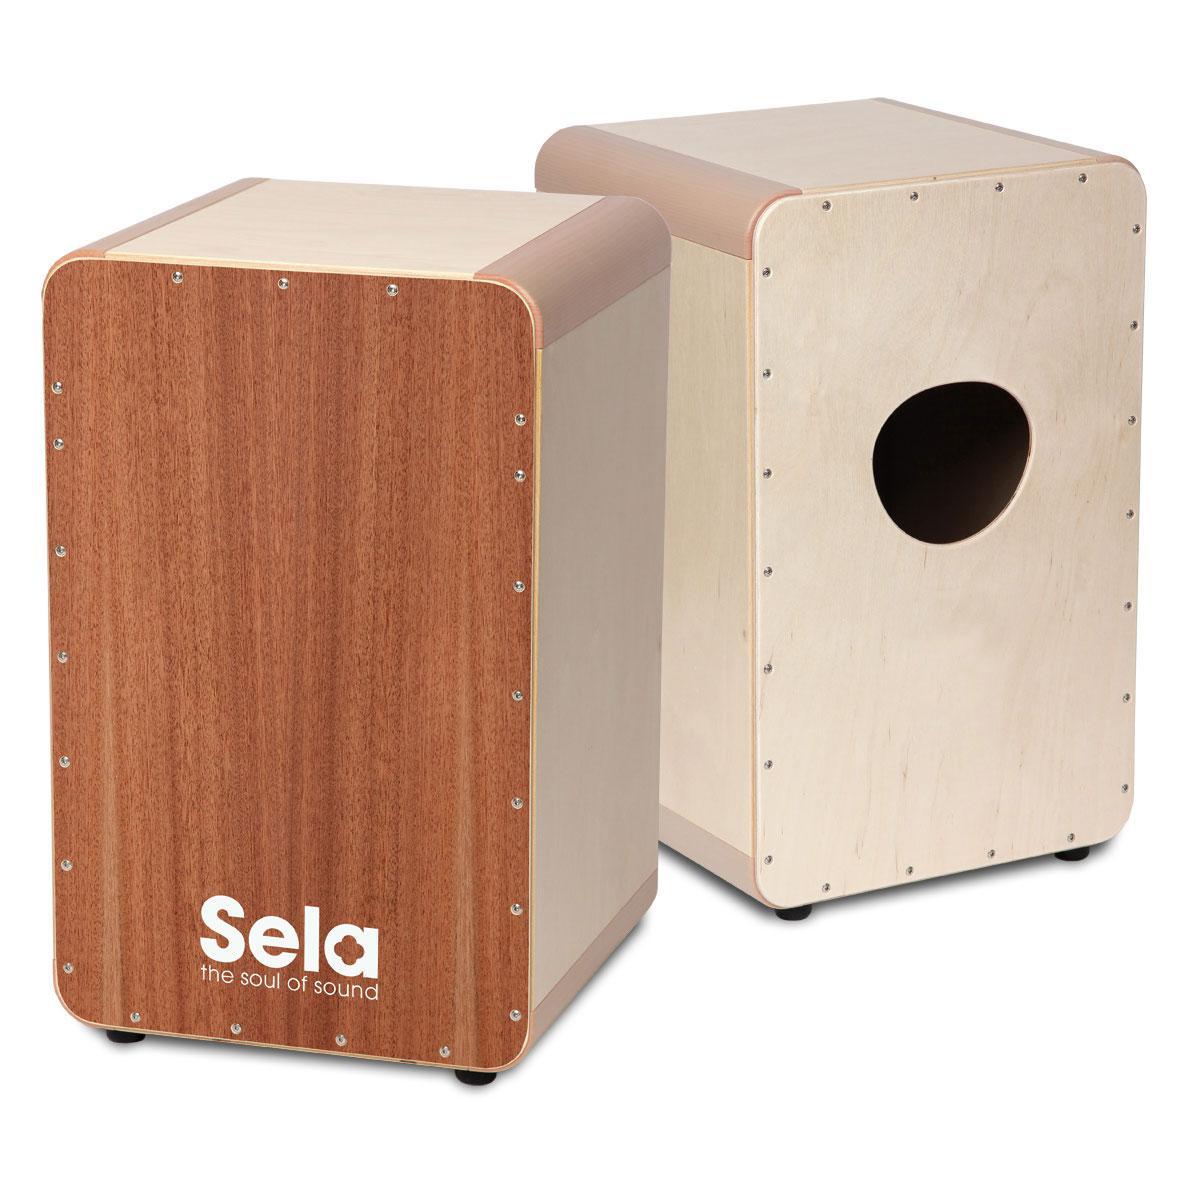 Sela Cajon Finish Set Cajon-Lack und spezieller Pinsel SE 028 NEU